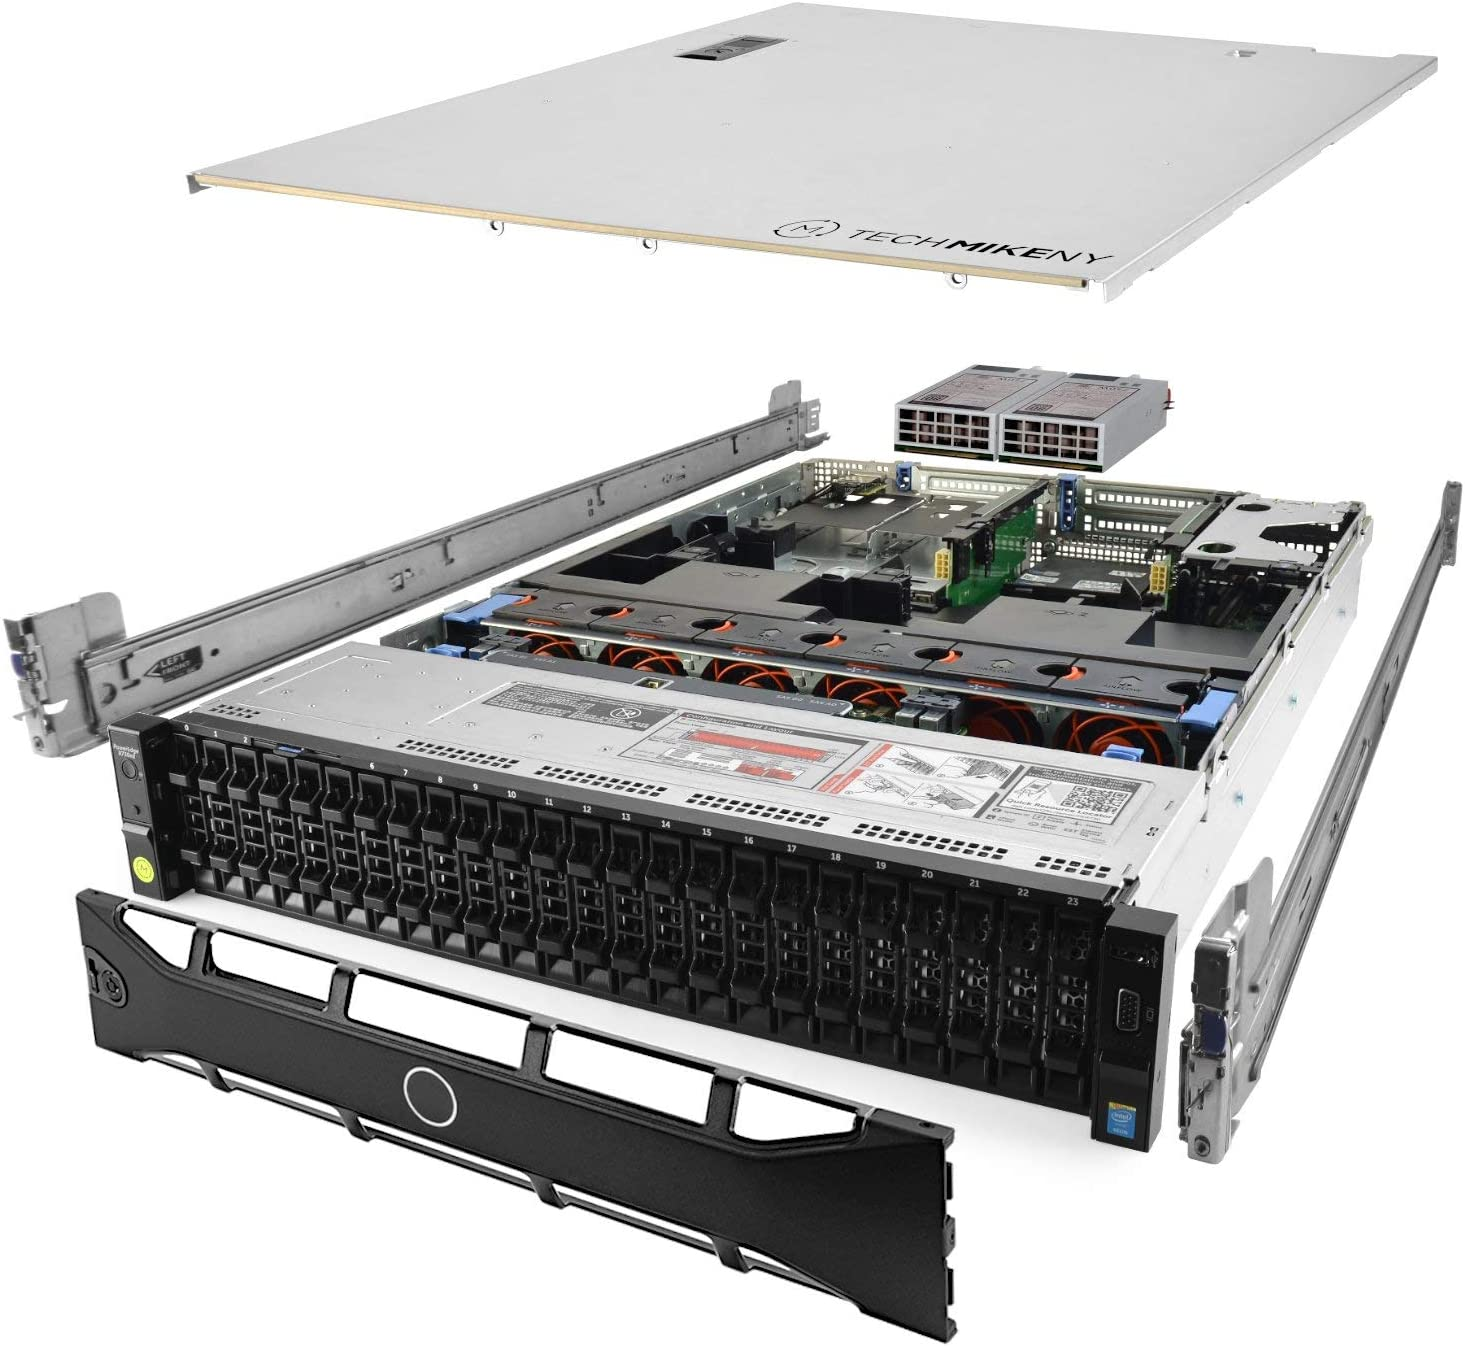 TechMikeNY Server 2.60Ghz 24-Core 512GB 26x 900GB H730P Bezel Rails PowerEdge R730xd (Renewed)